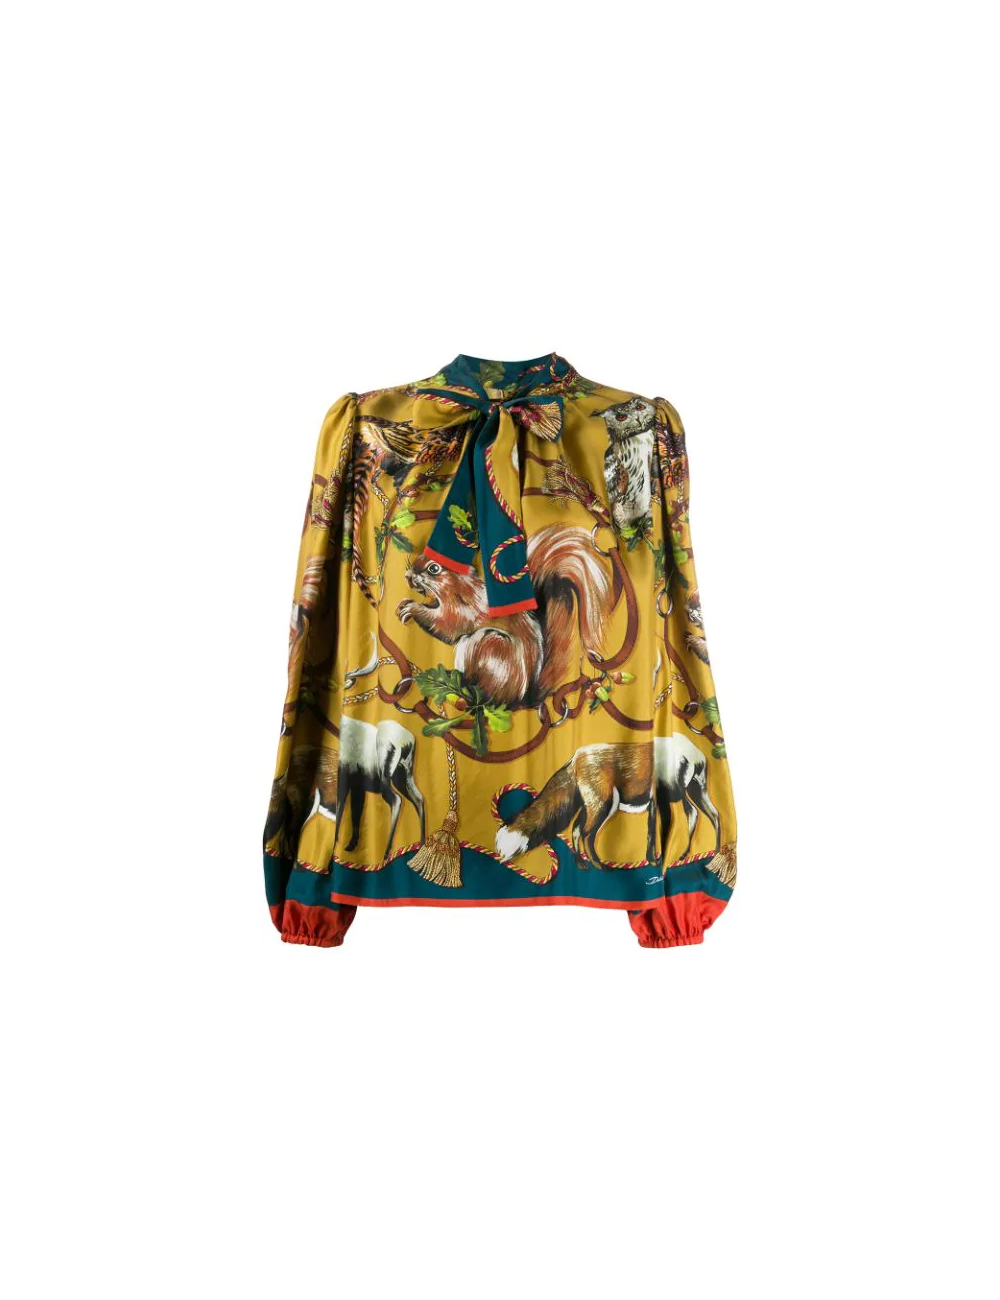 Printed blouse Dolce Gabbana - BIG BOSS MEGEVE